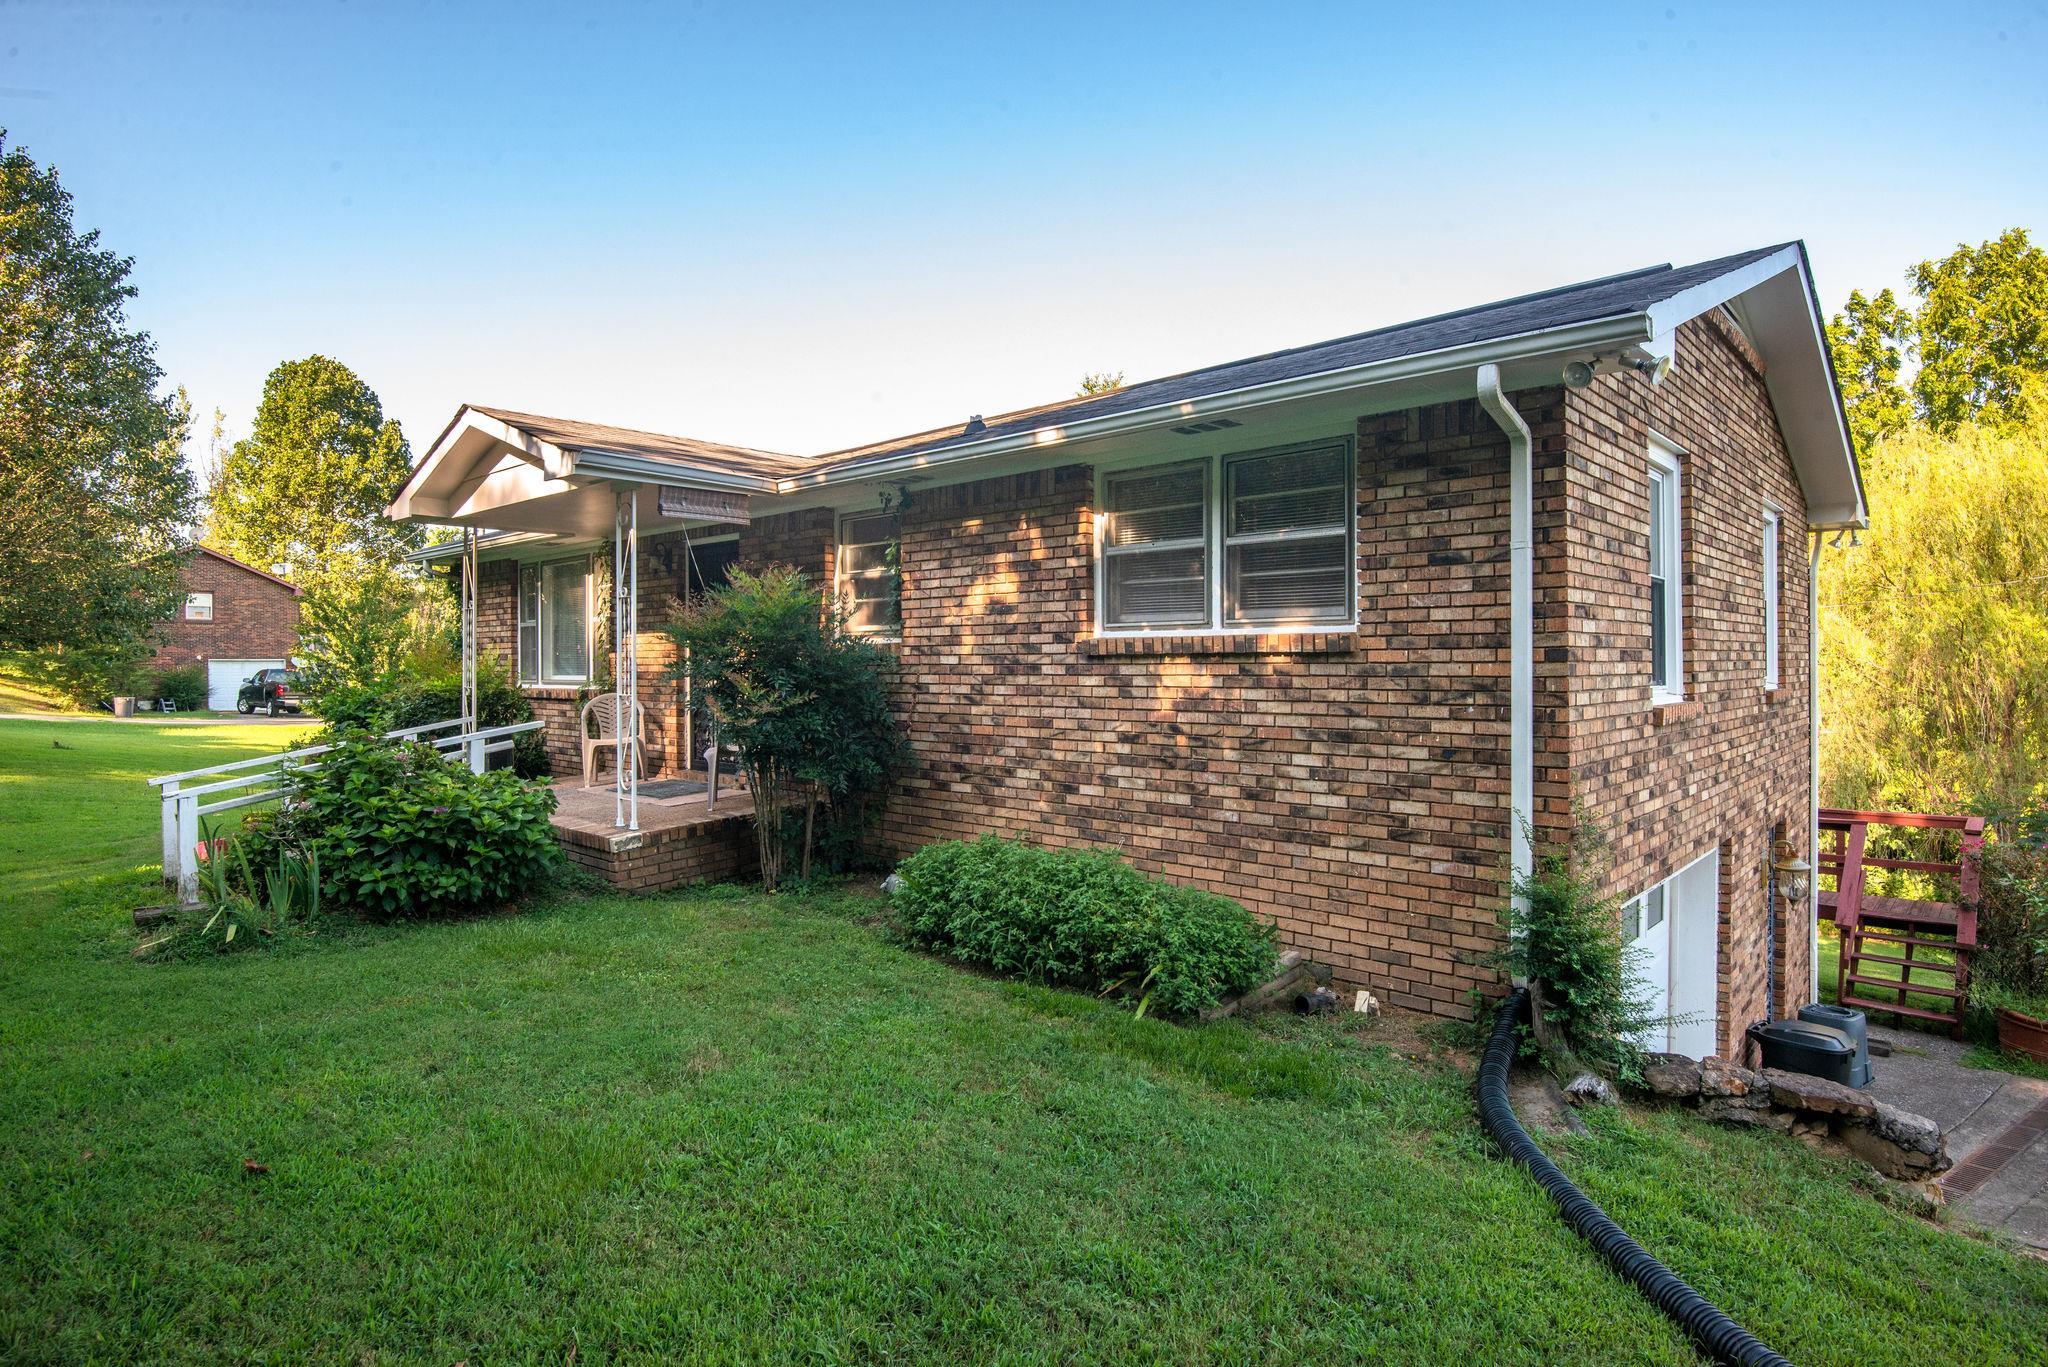 1020 Dawson Rd, White Bluff, TN 37187 - White Bluff, TN real estate listing